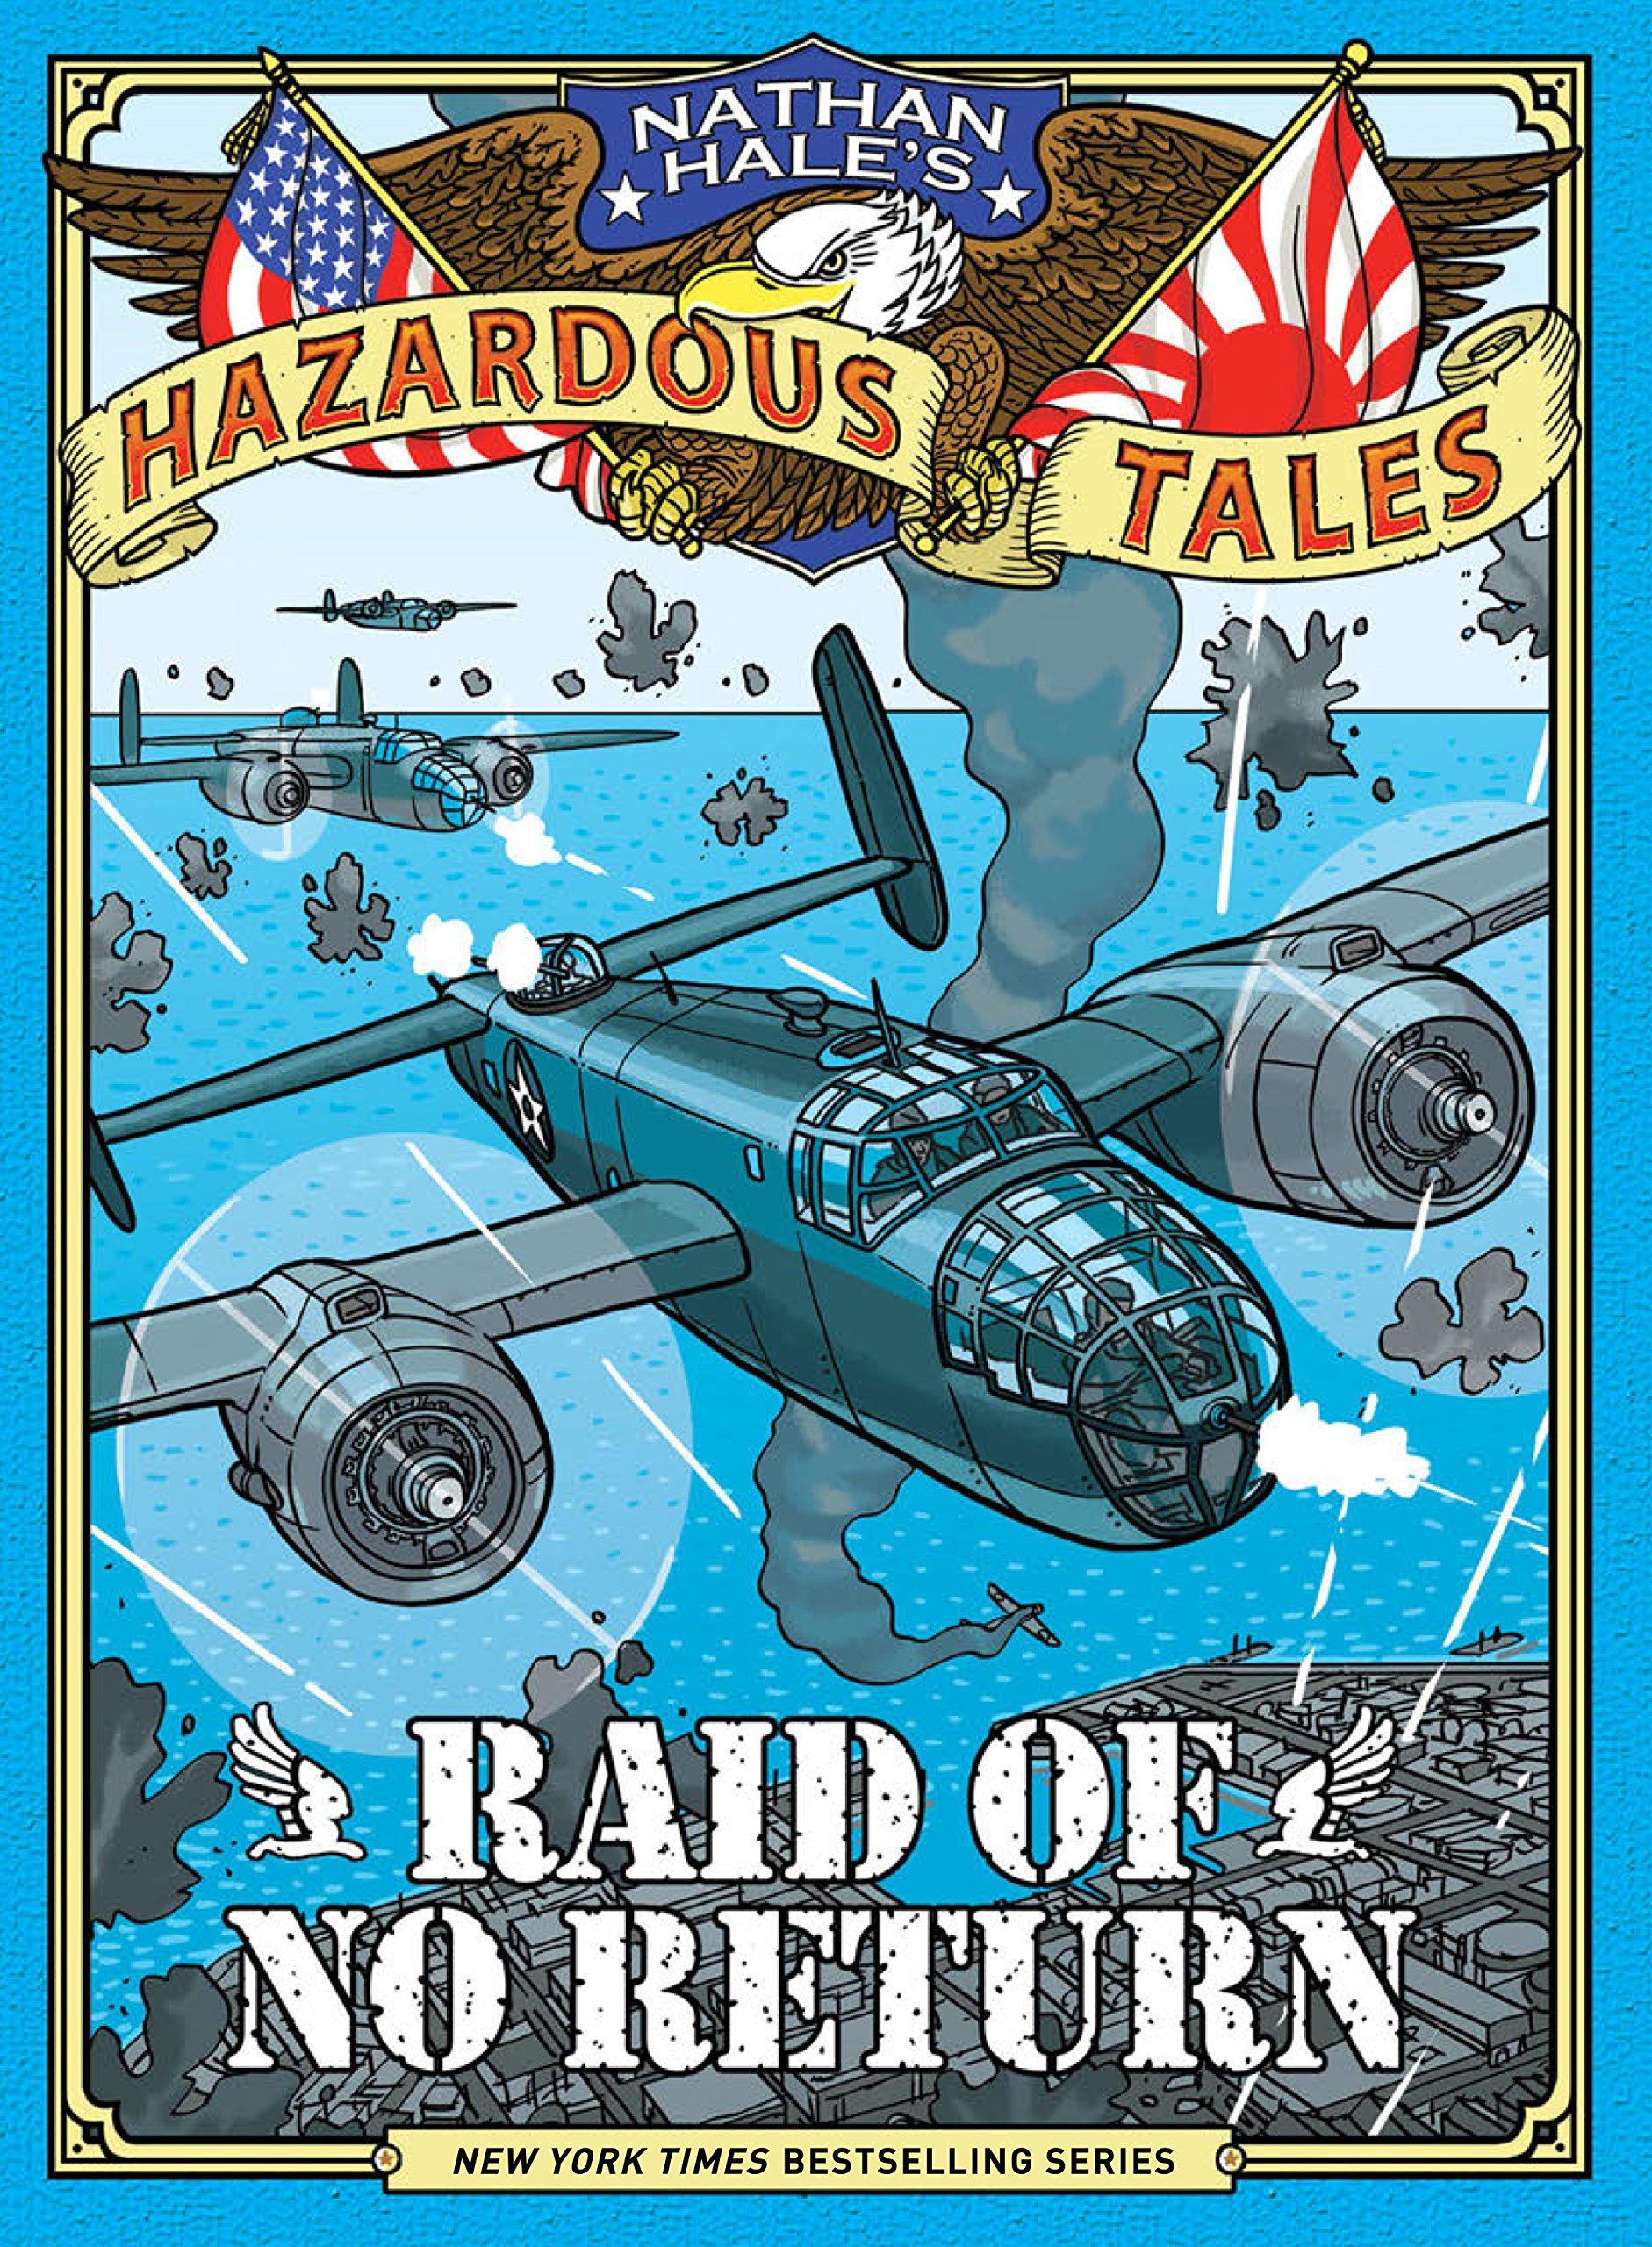 Raid of No Return (Nathan Hale's Hazardous Tales #7): A World War II Tale of the Doolittle Raid (English Edition)